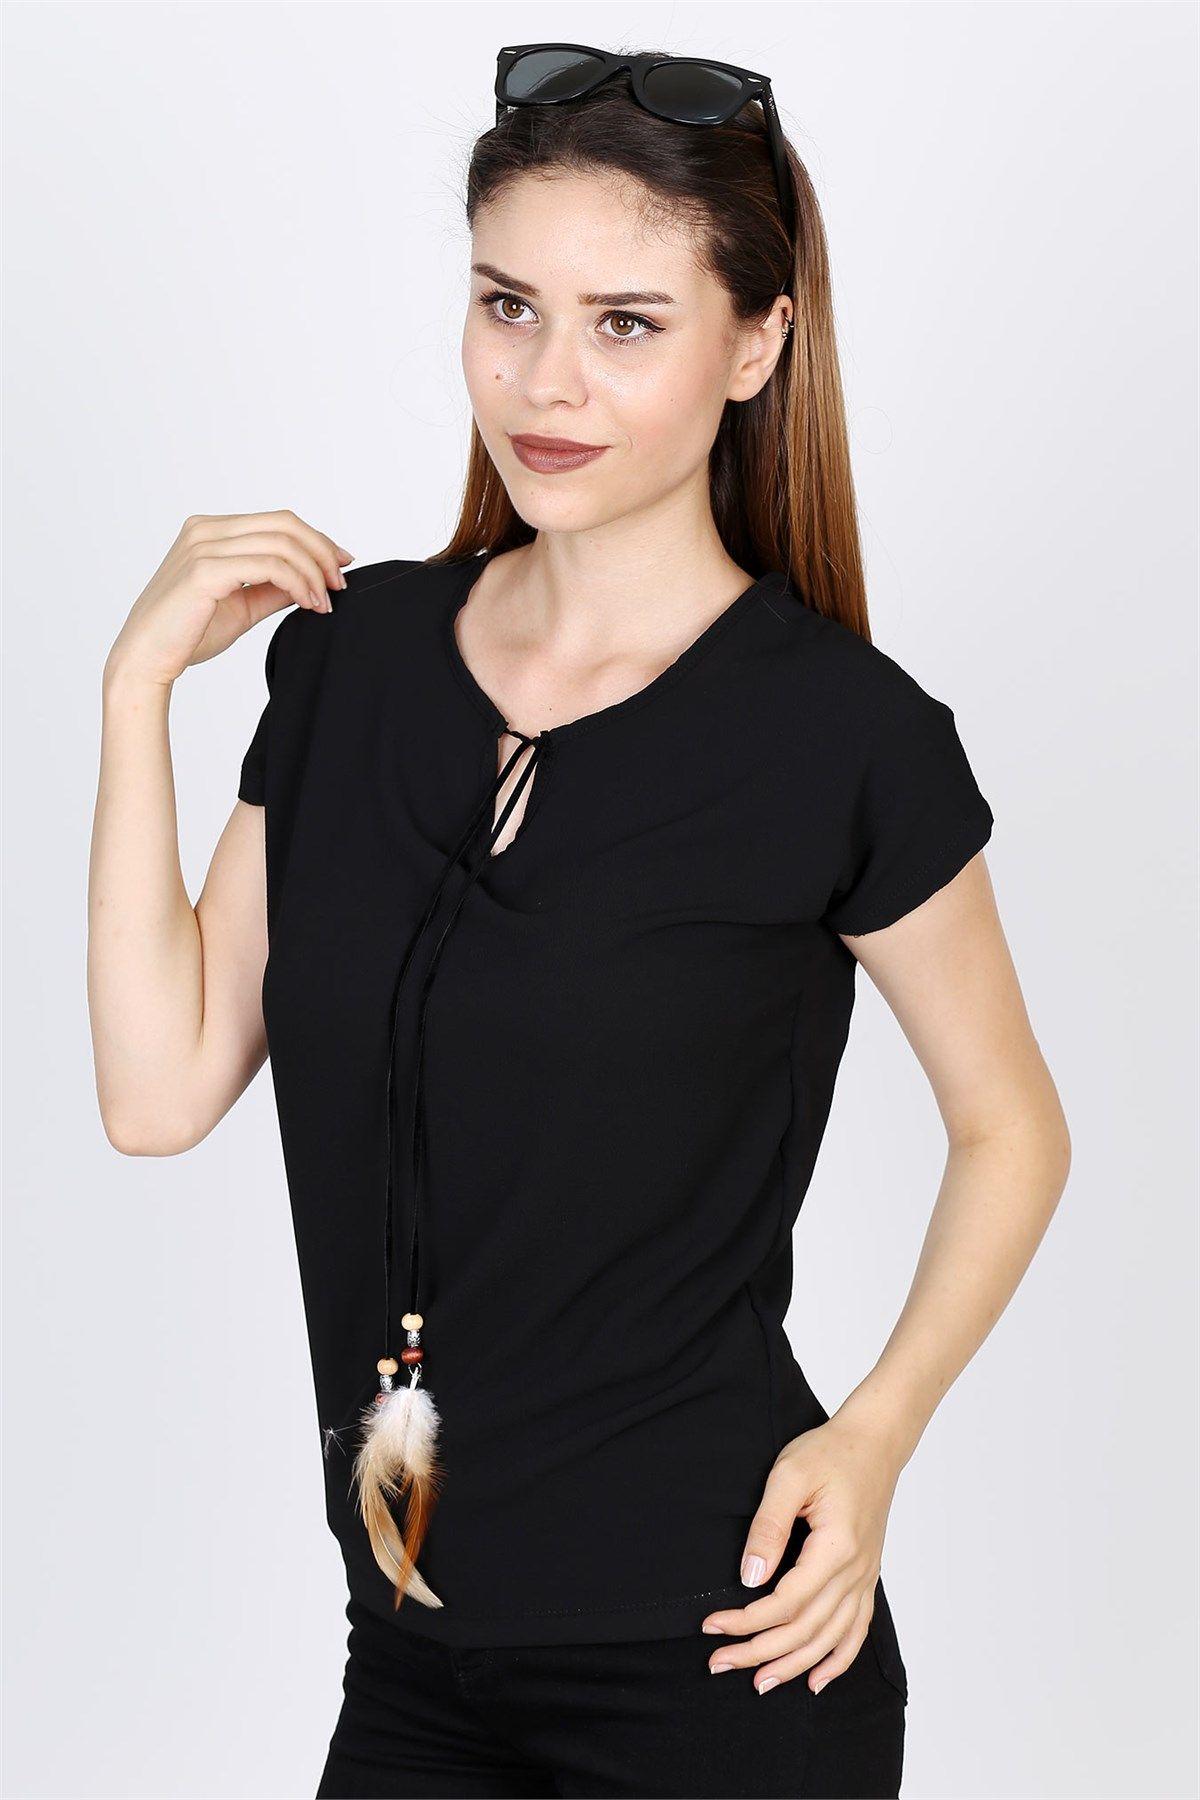 Yakasi Ipli Bluz 2032b Moda Stilleri Bluz Giyim